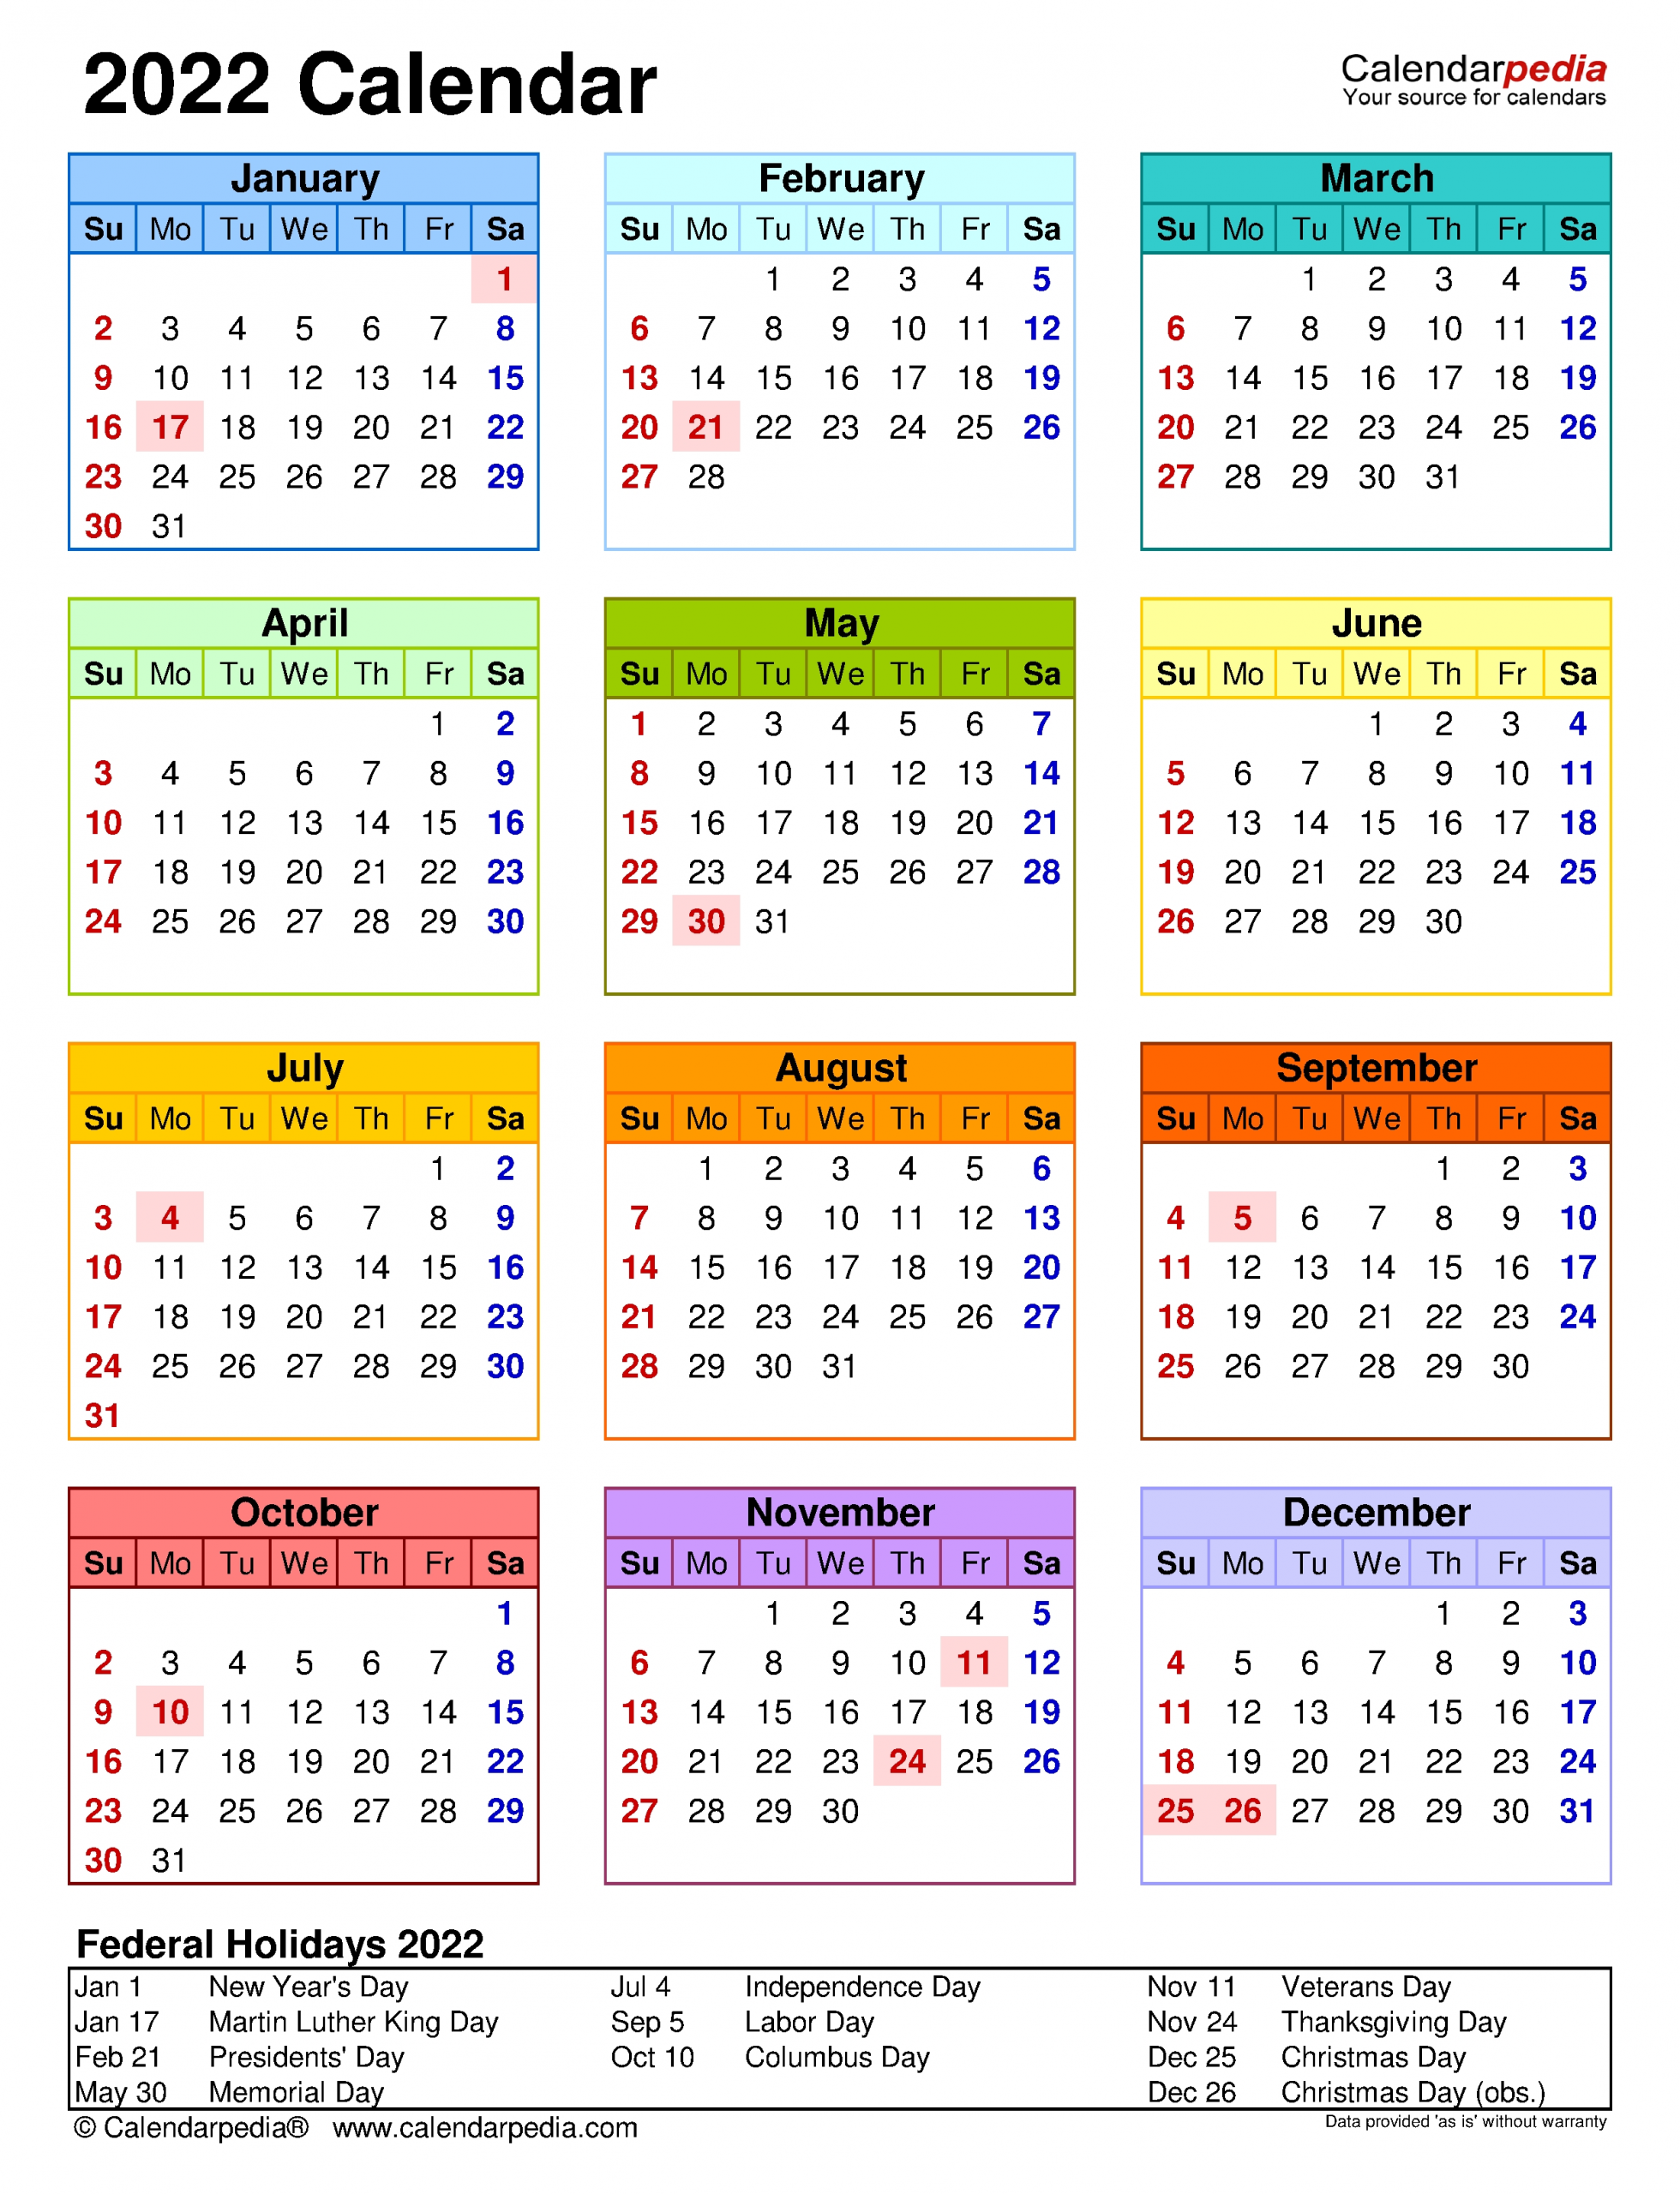 2022 Calendar - Free Printable Excel Templates - Calendarpedia